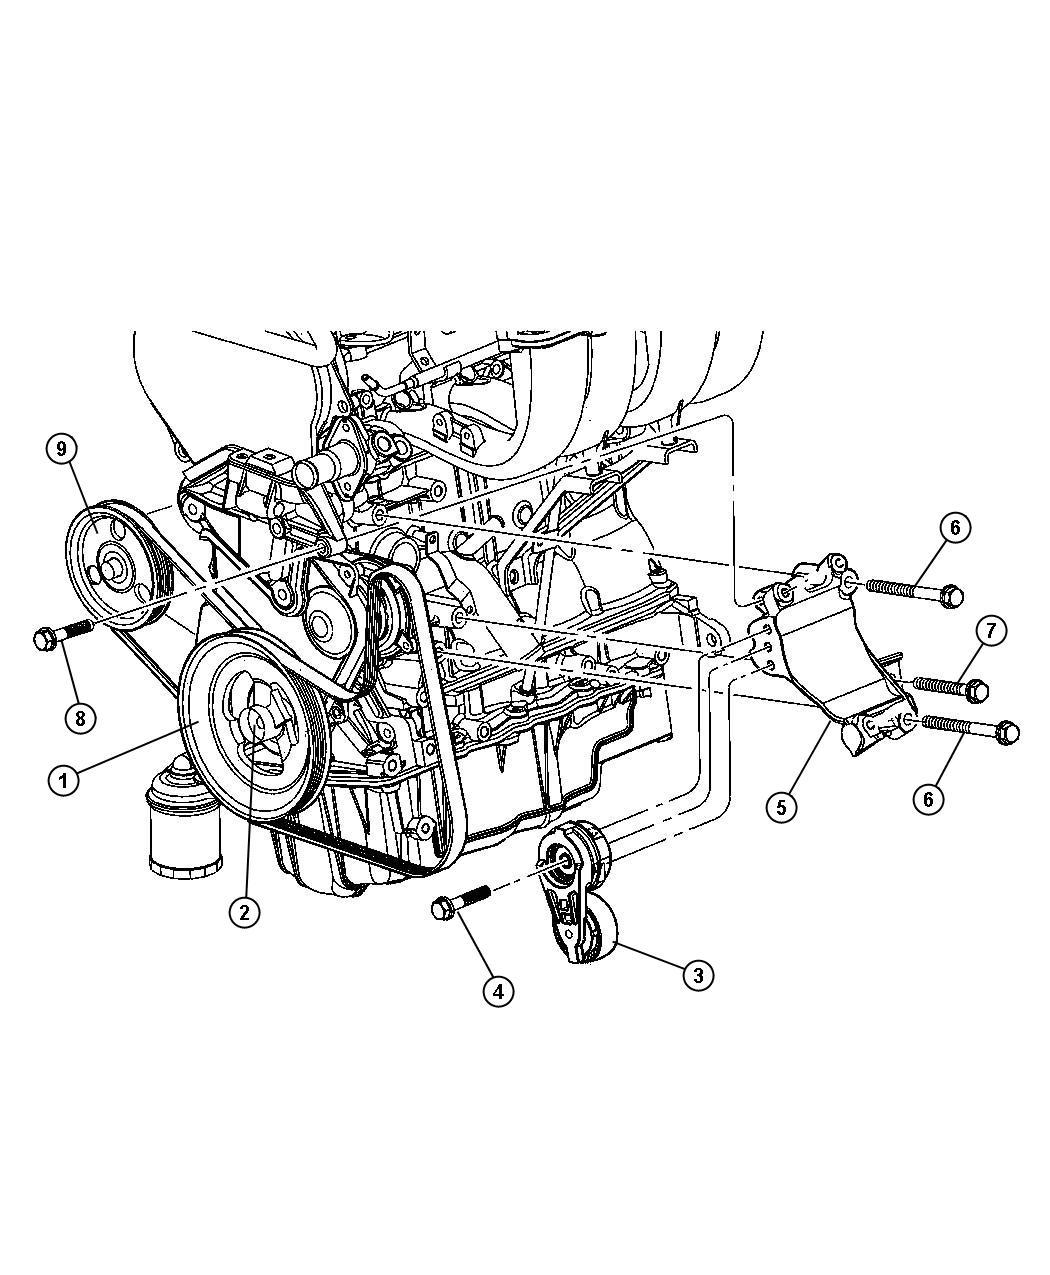 1998 Dodge Durango Damper. Engine vibration. Dohc, timing